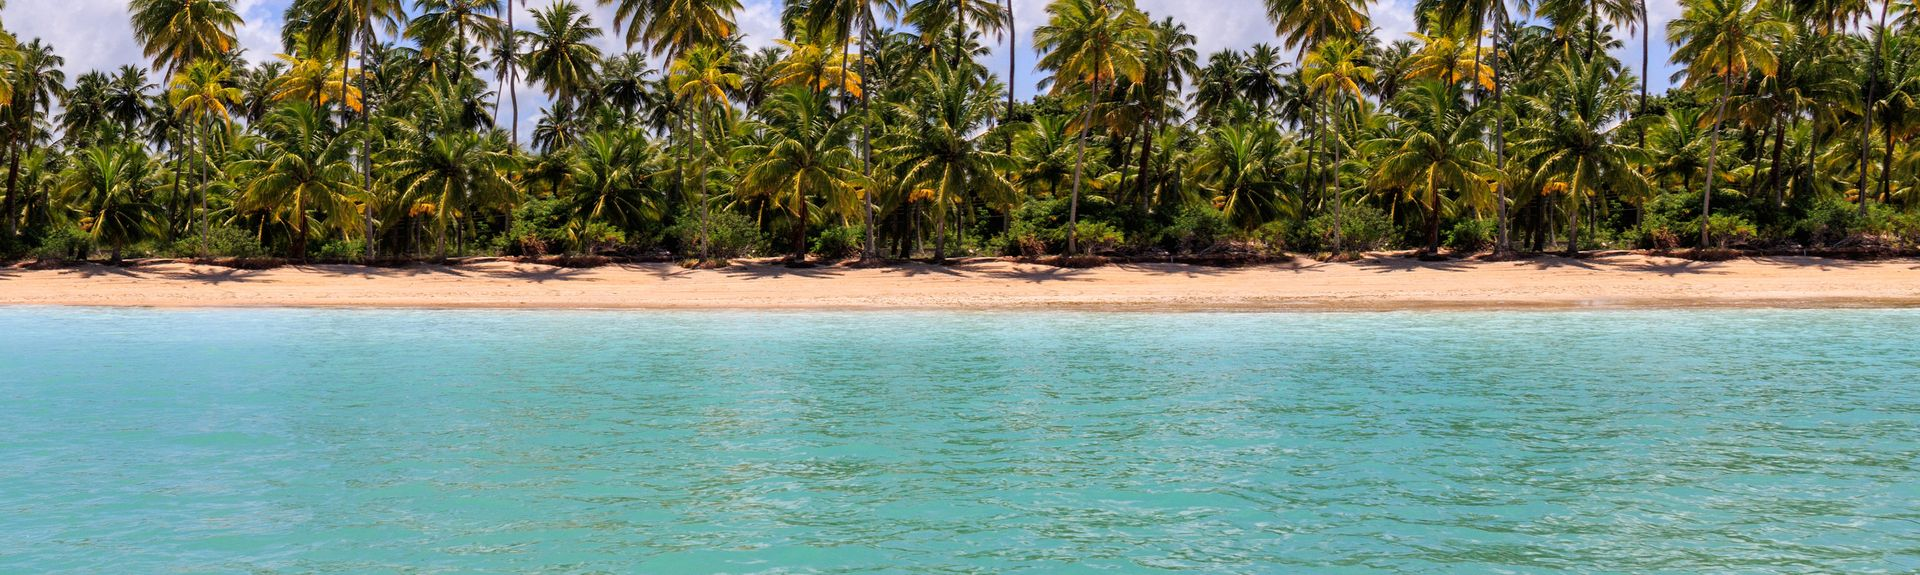 Maragogi, Litoral Norte Alagoano, Alagoas, Brazil